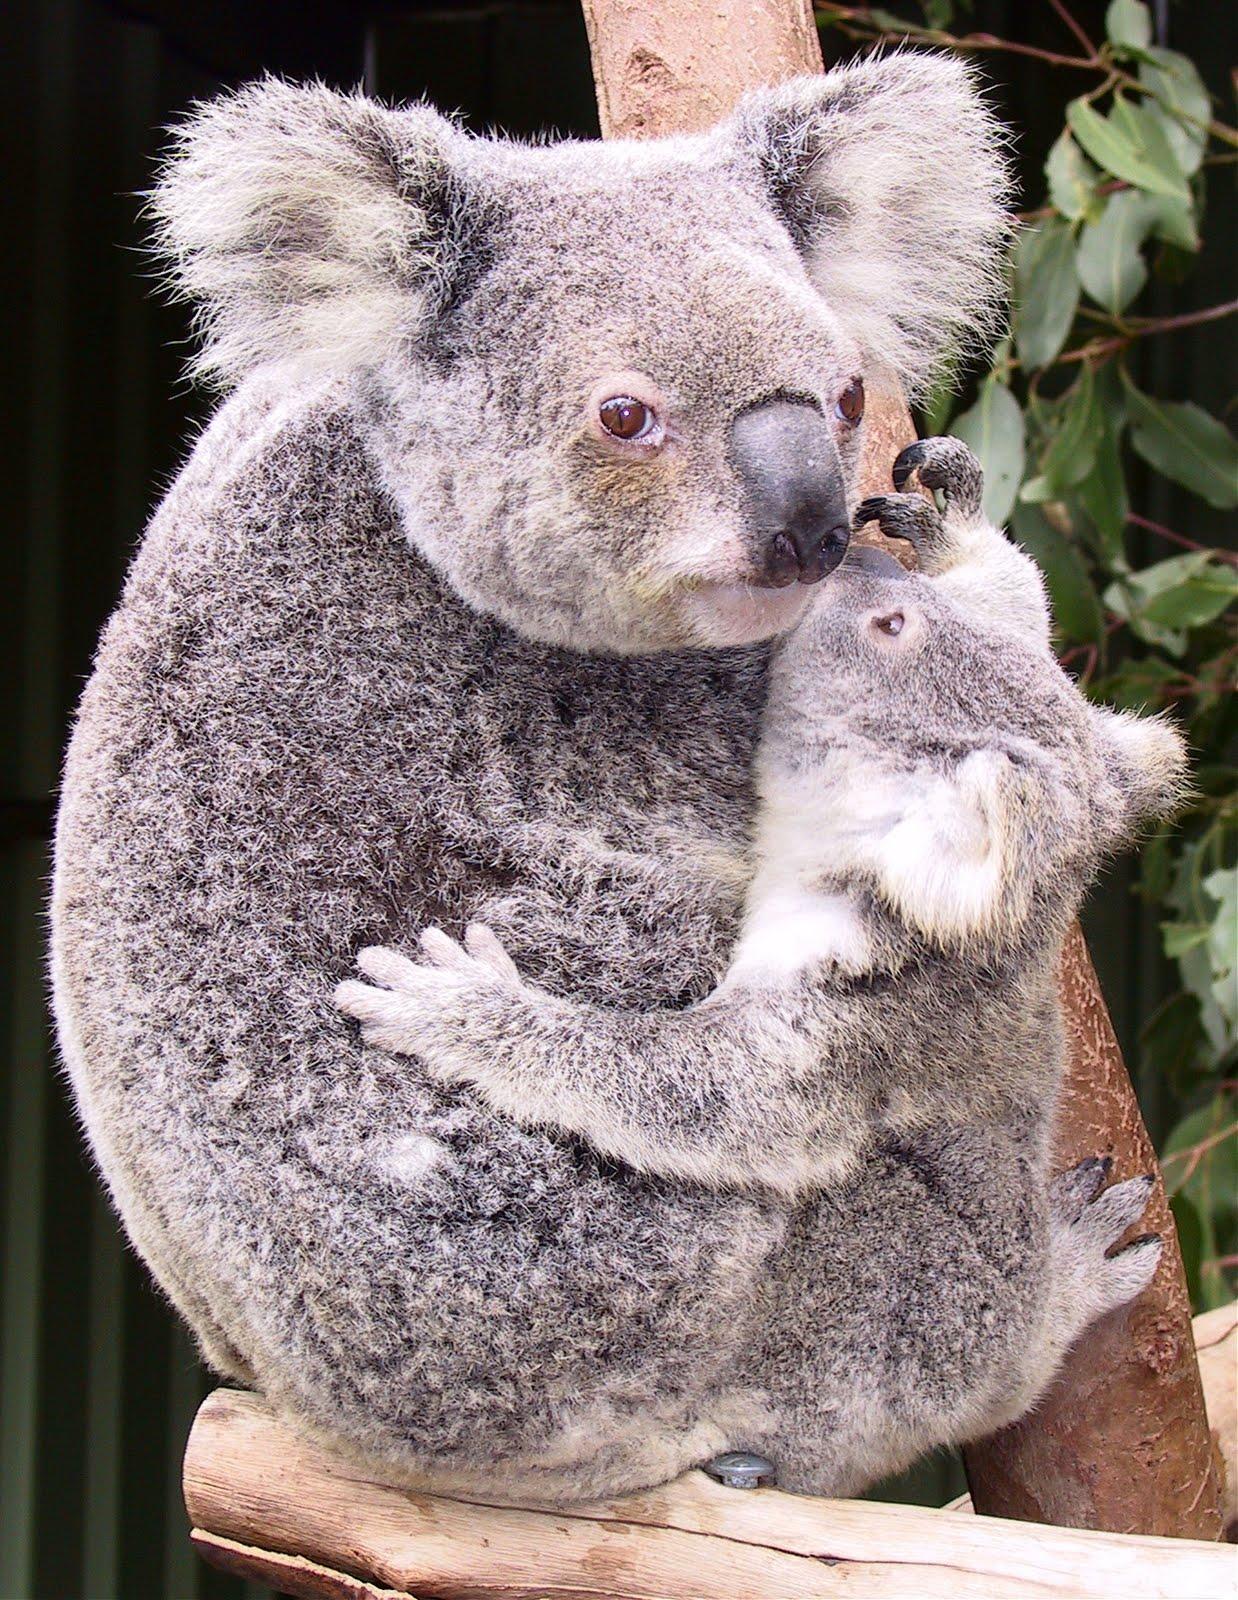 Funny koala photos funny animal - Pictures of koalas and baby koalas ...